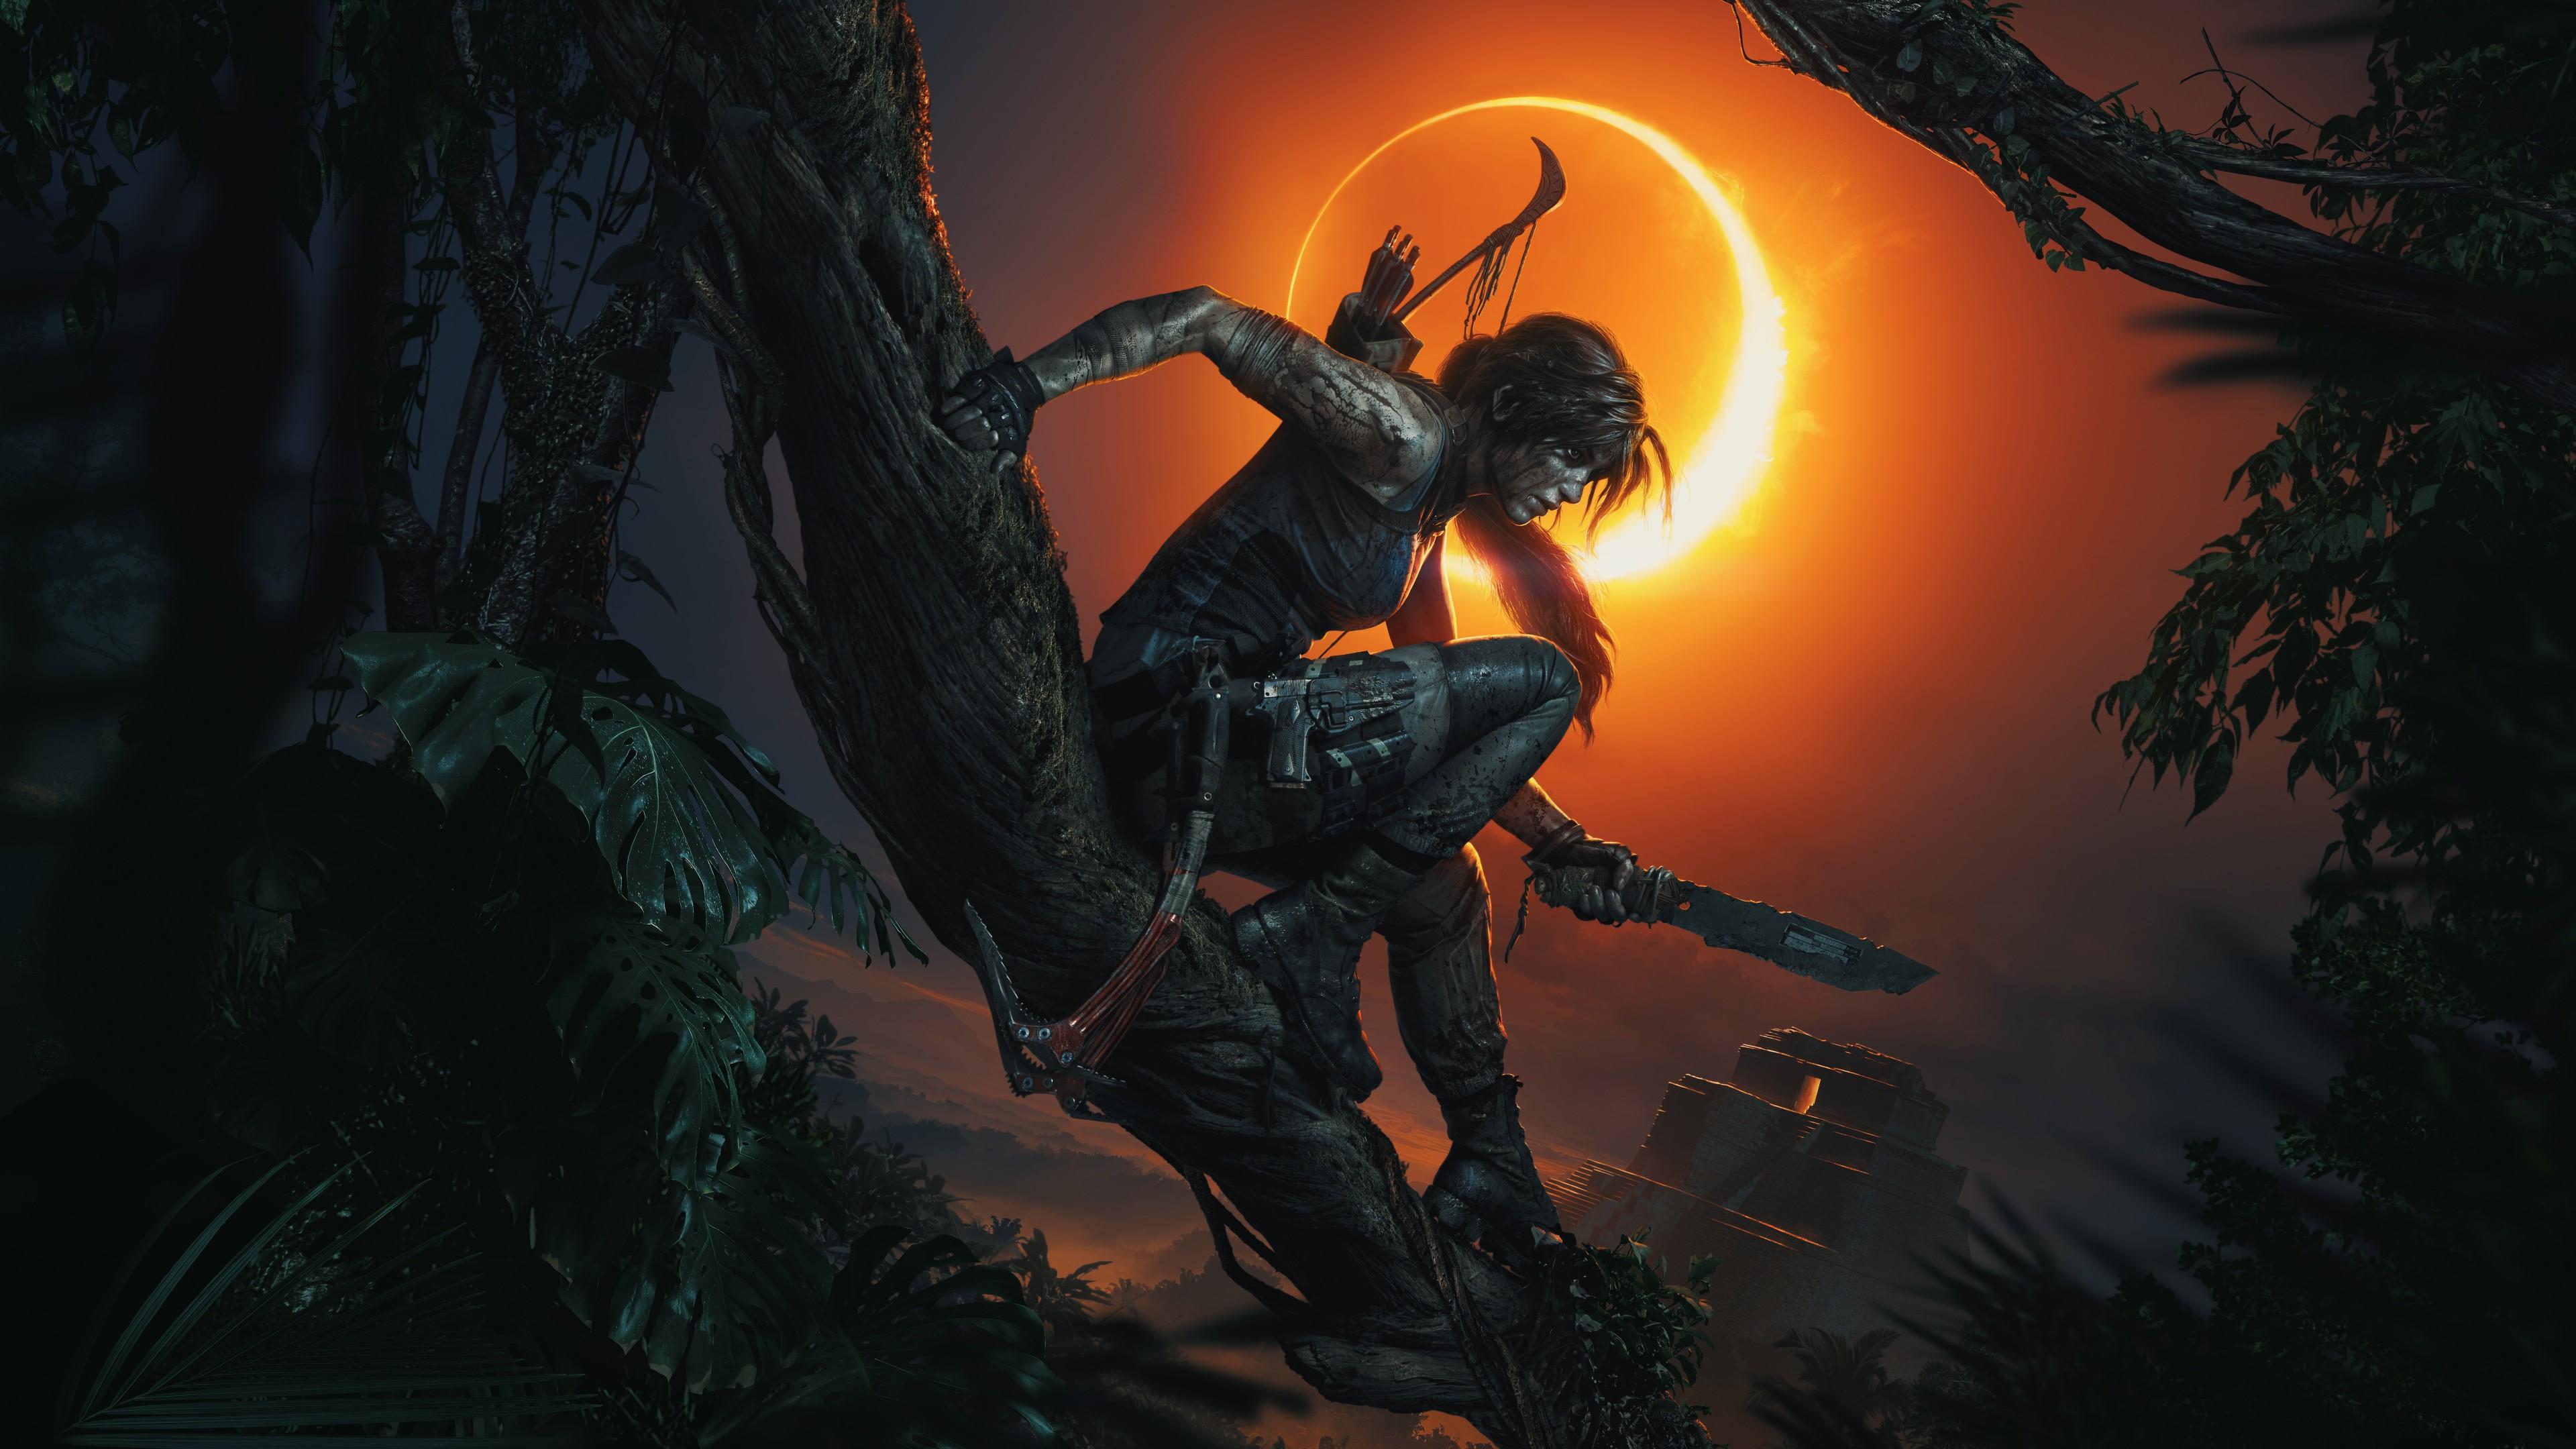 Tomb Raider Iphone X Wallpaper Lara Croft Shadow Of The Tomb Raider Wallpapers Hd